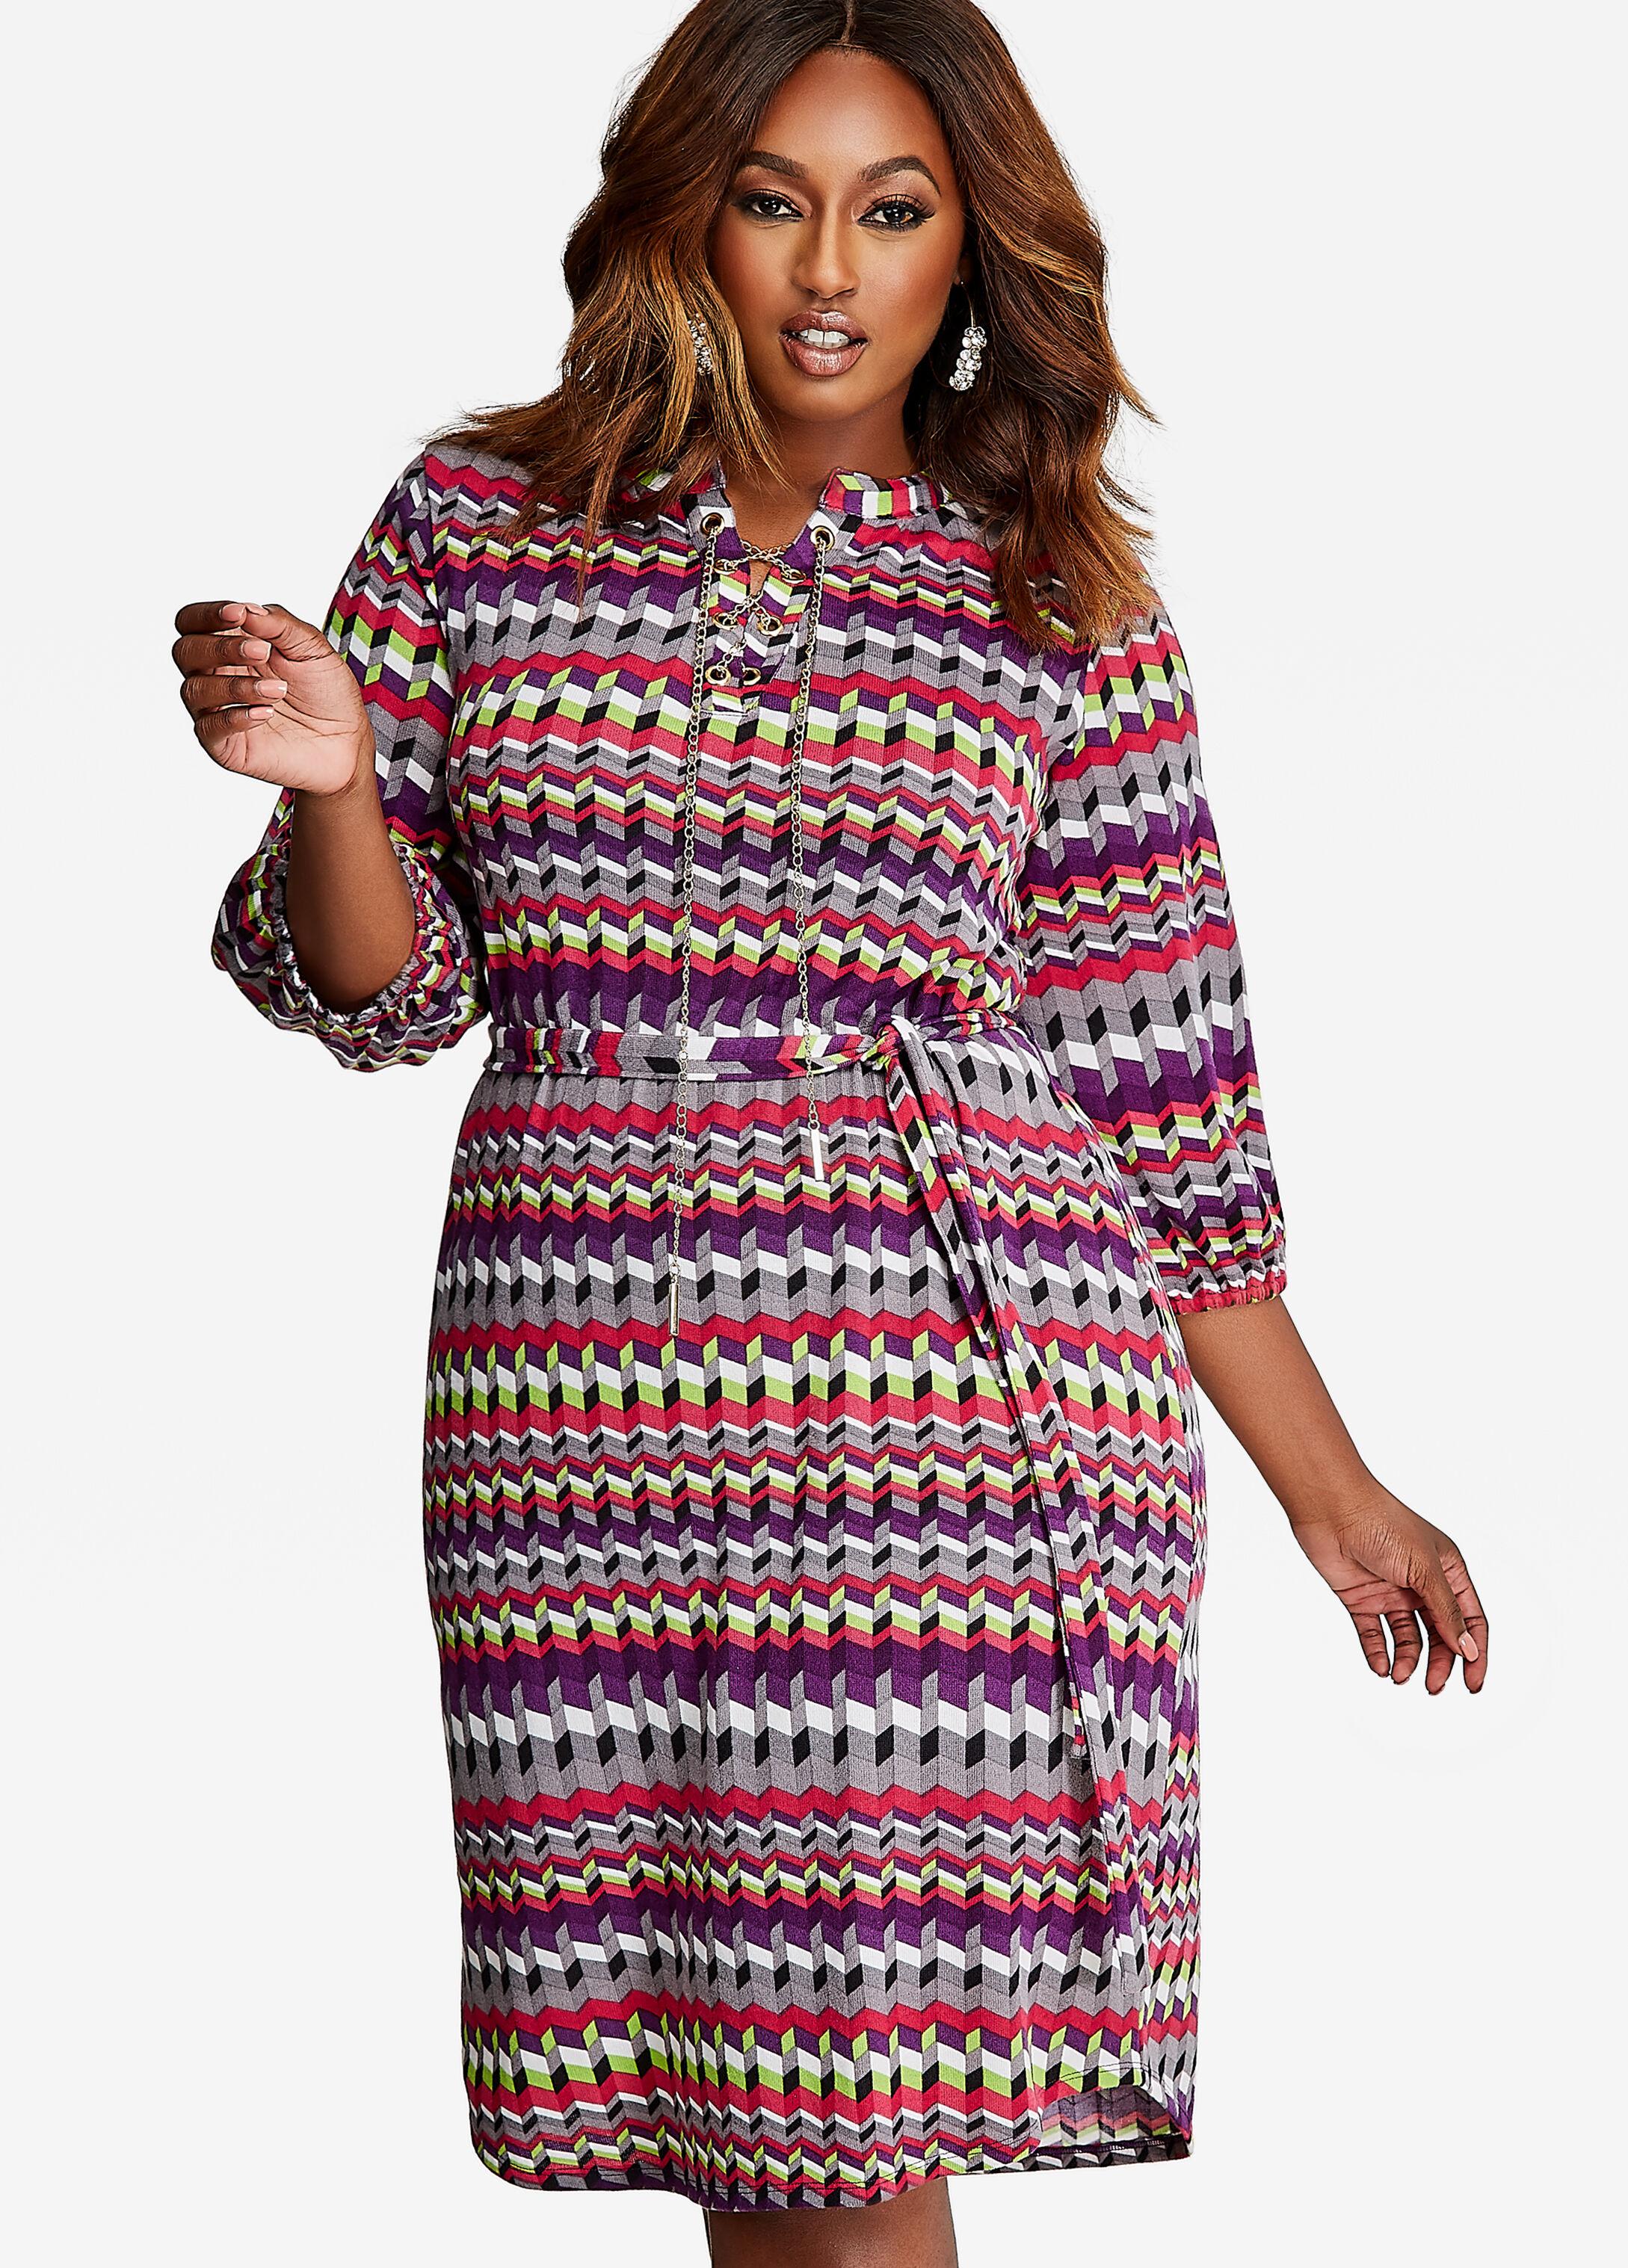 Grommet Chain Knit Sweater Dress